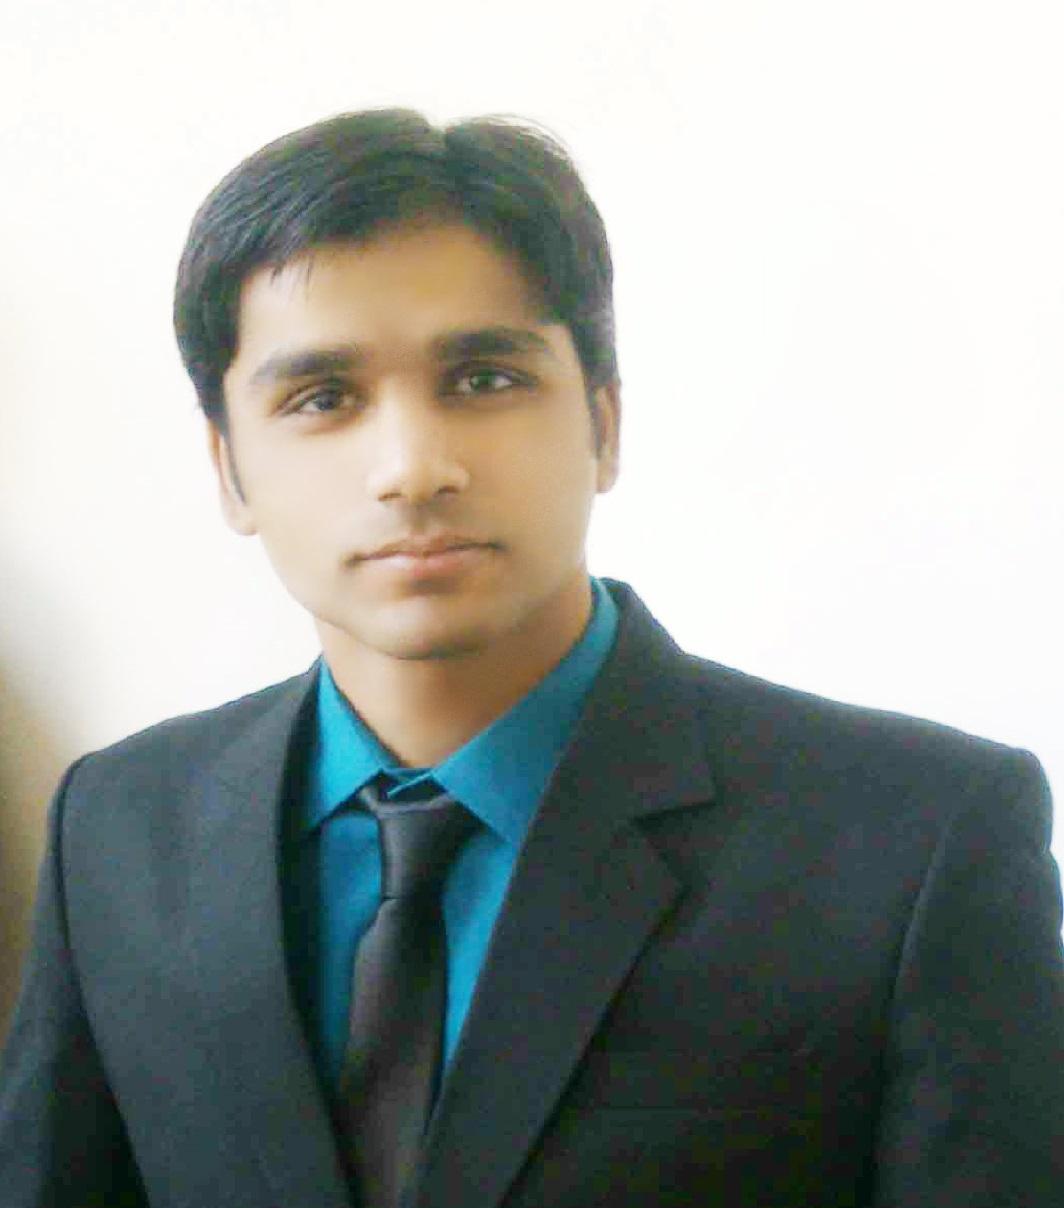 Muhammad Imran Kalwar Accounting, Management, Human Resources, Finance